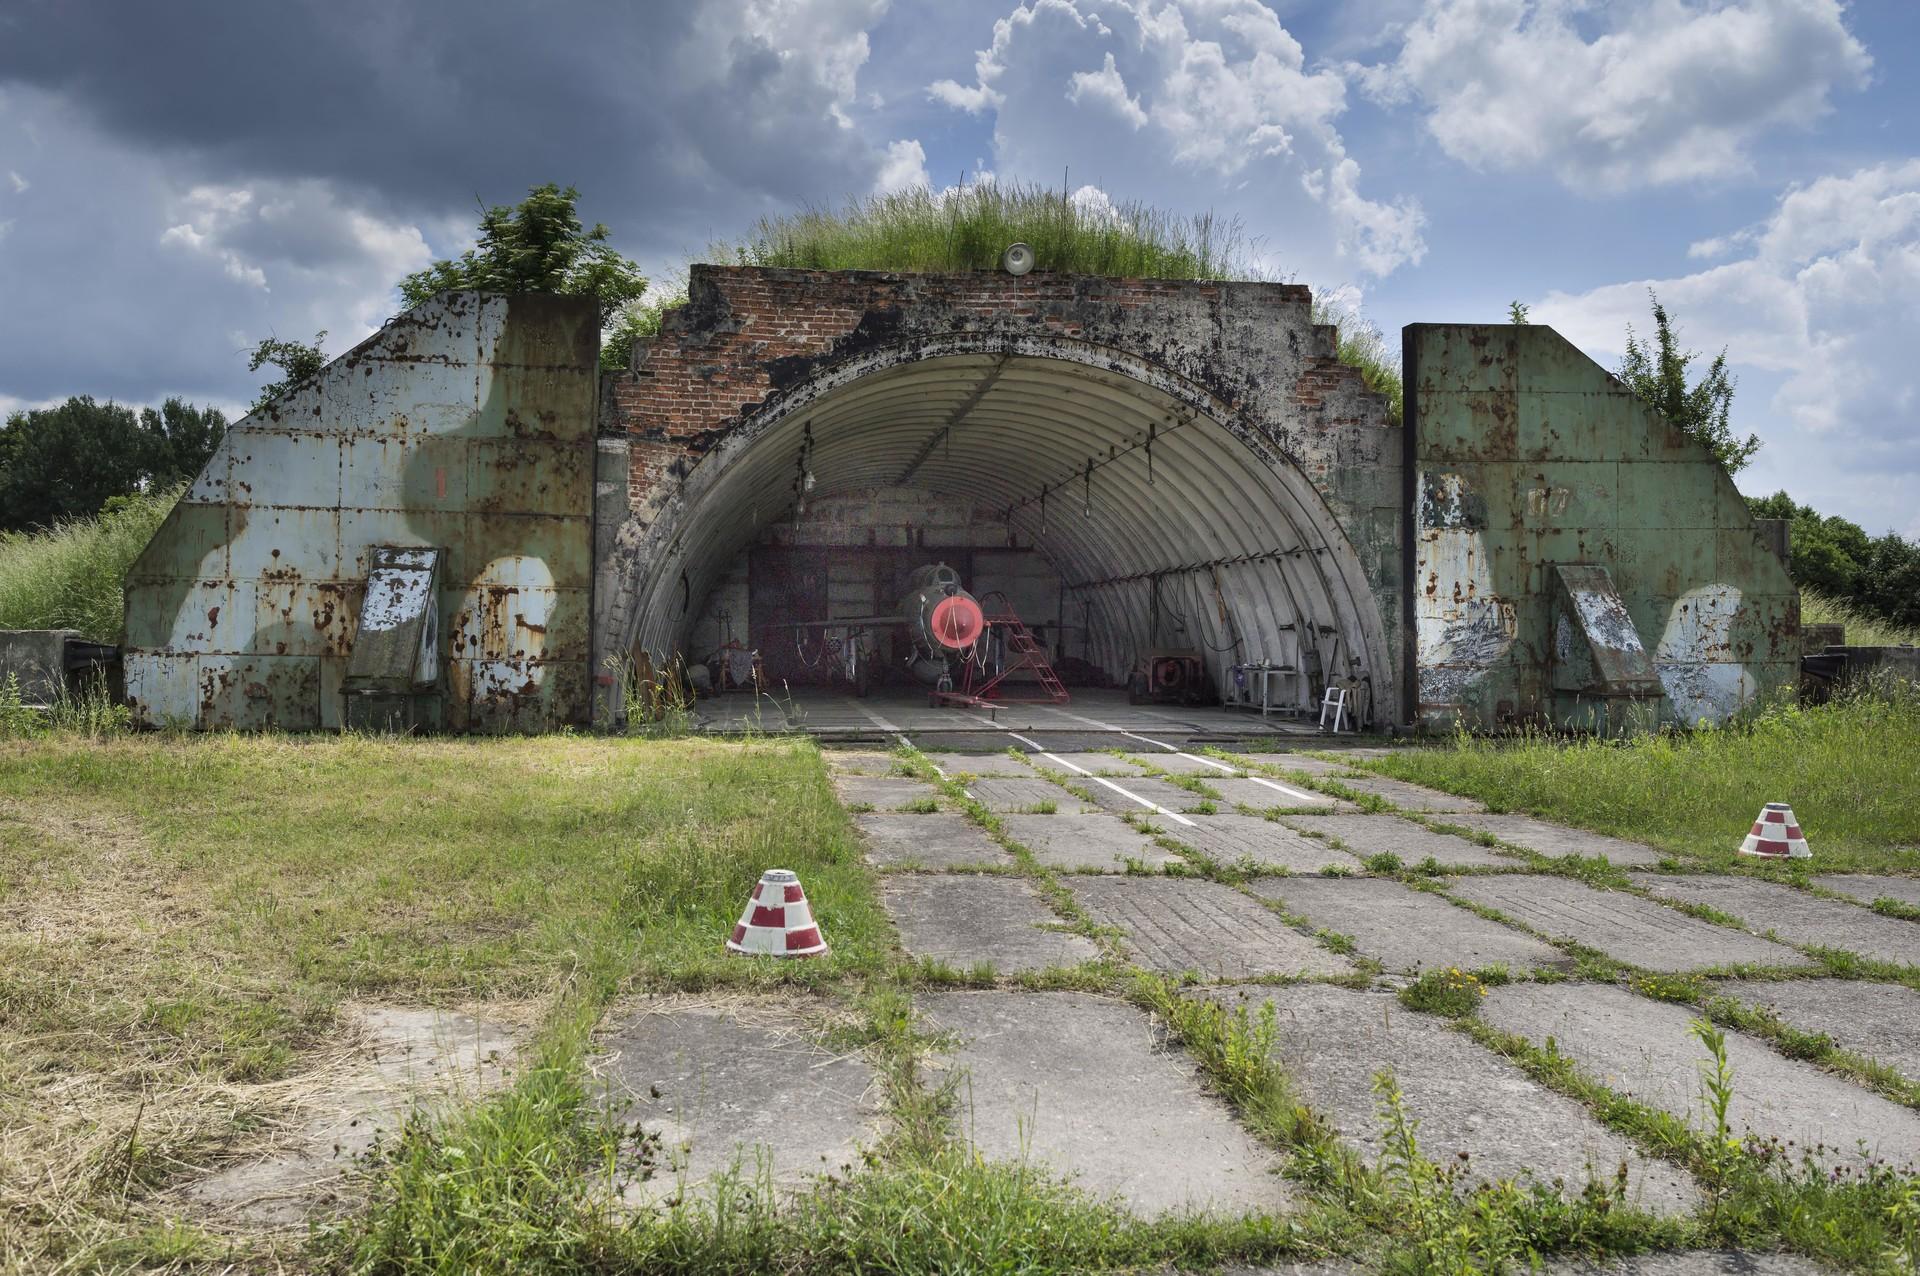 Opuščen sovjetski hangar z letalom MiG-21, Nobitz, Altenburg, Turingija, Nemčija